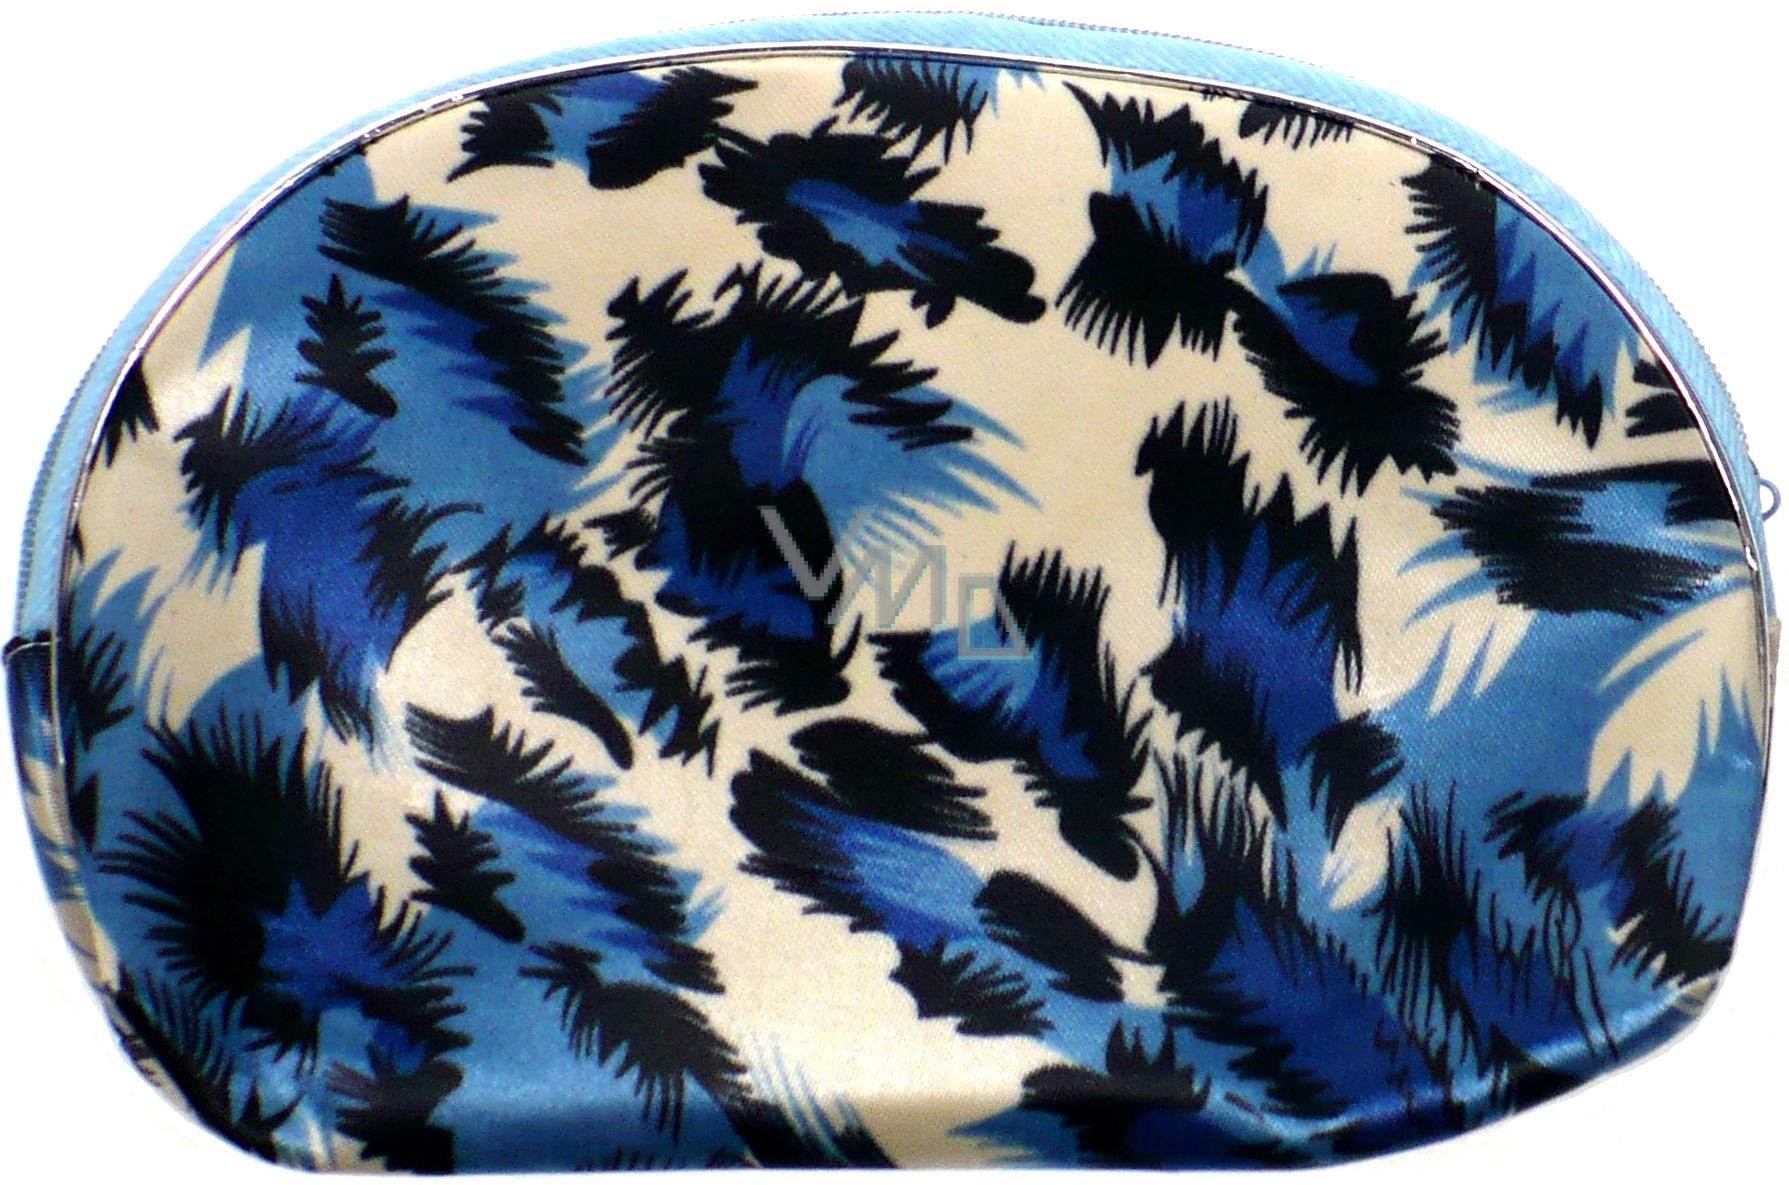 Etue Tygrovitá bílo-modro-černá 13 x 10 x 1,5 cm 1 kus 70100